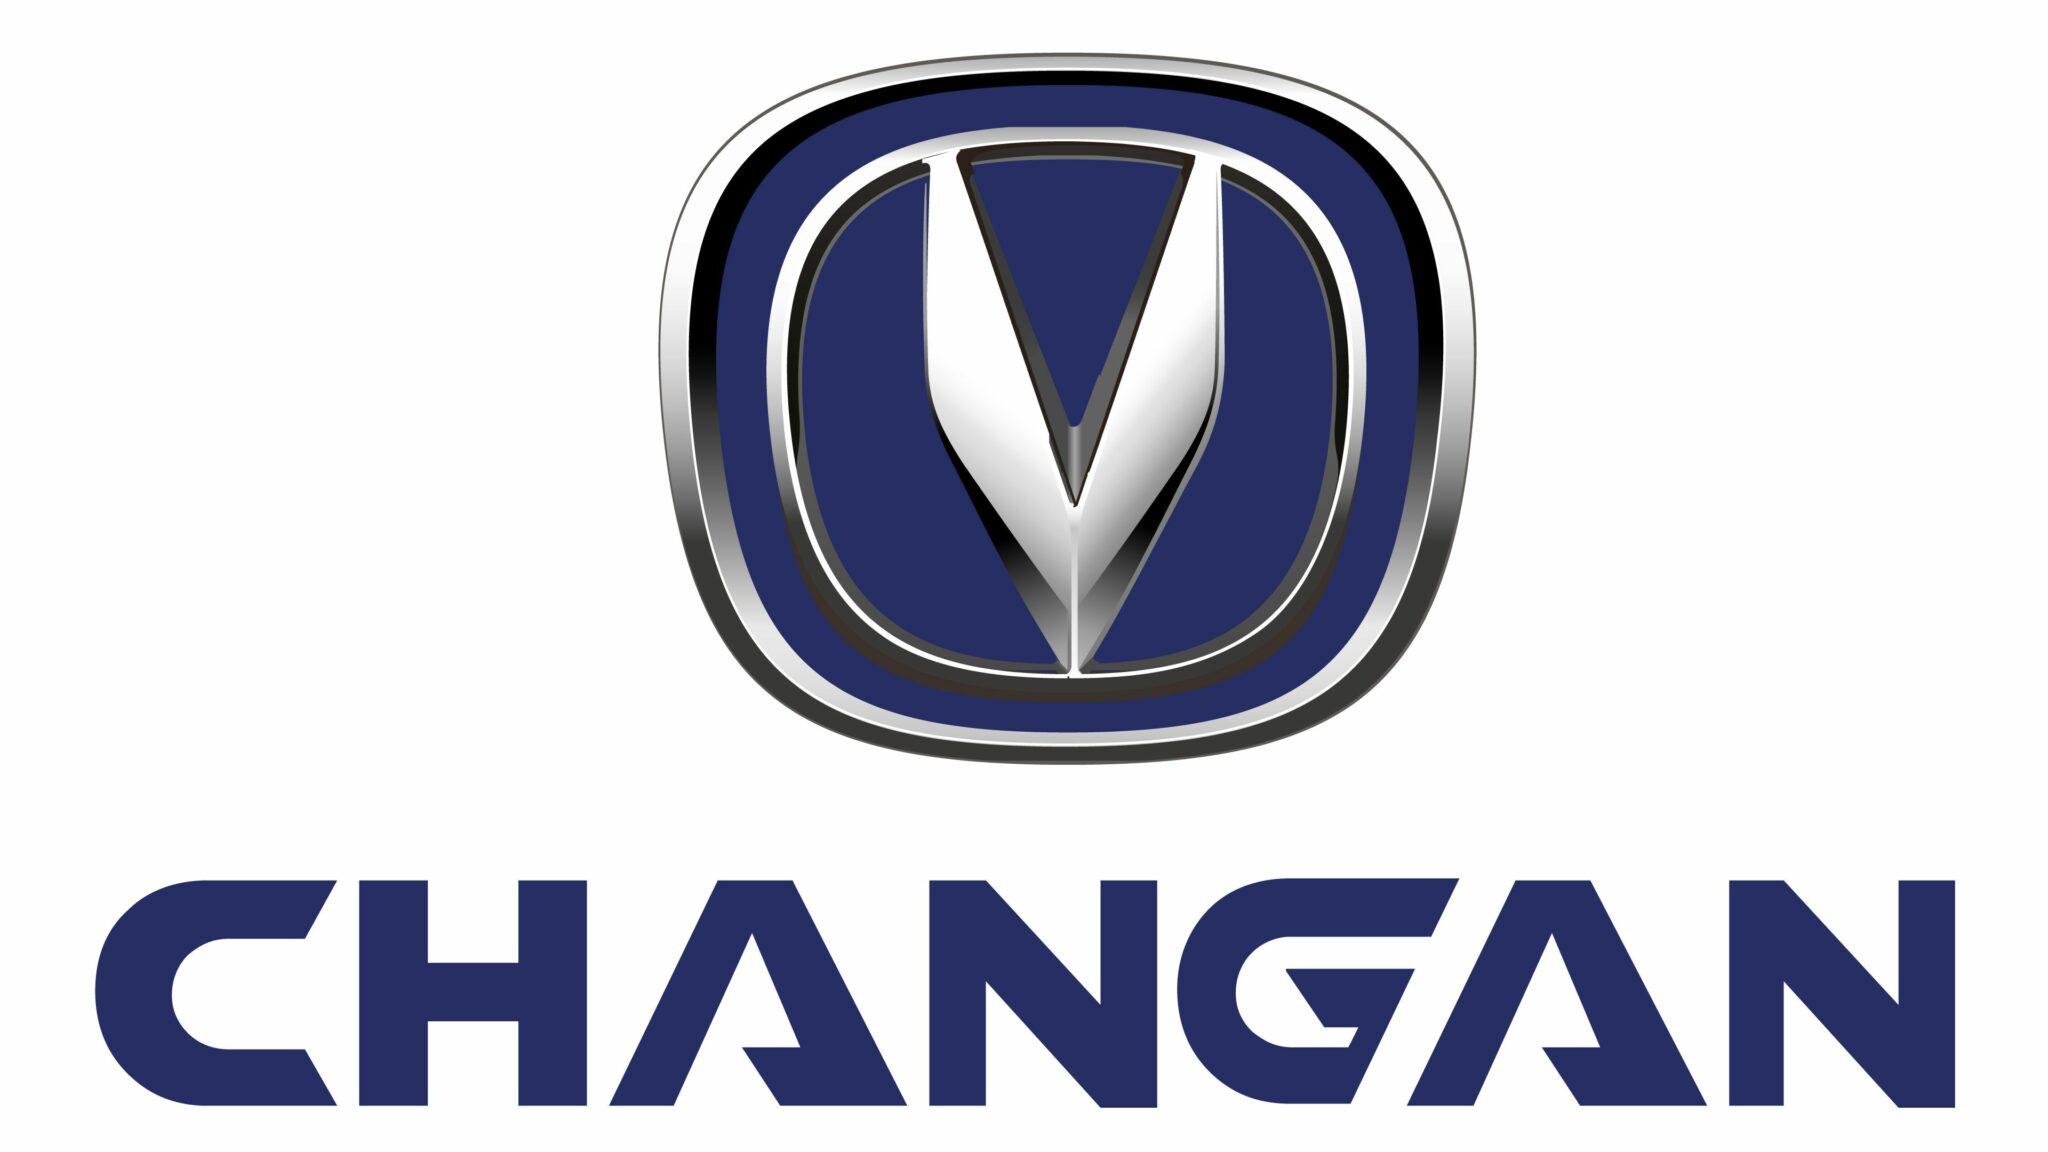 Changan логотип автомобиля